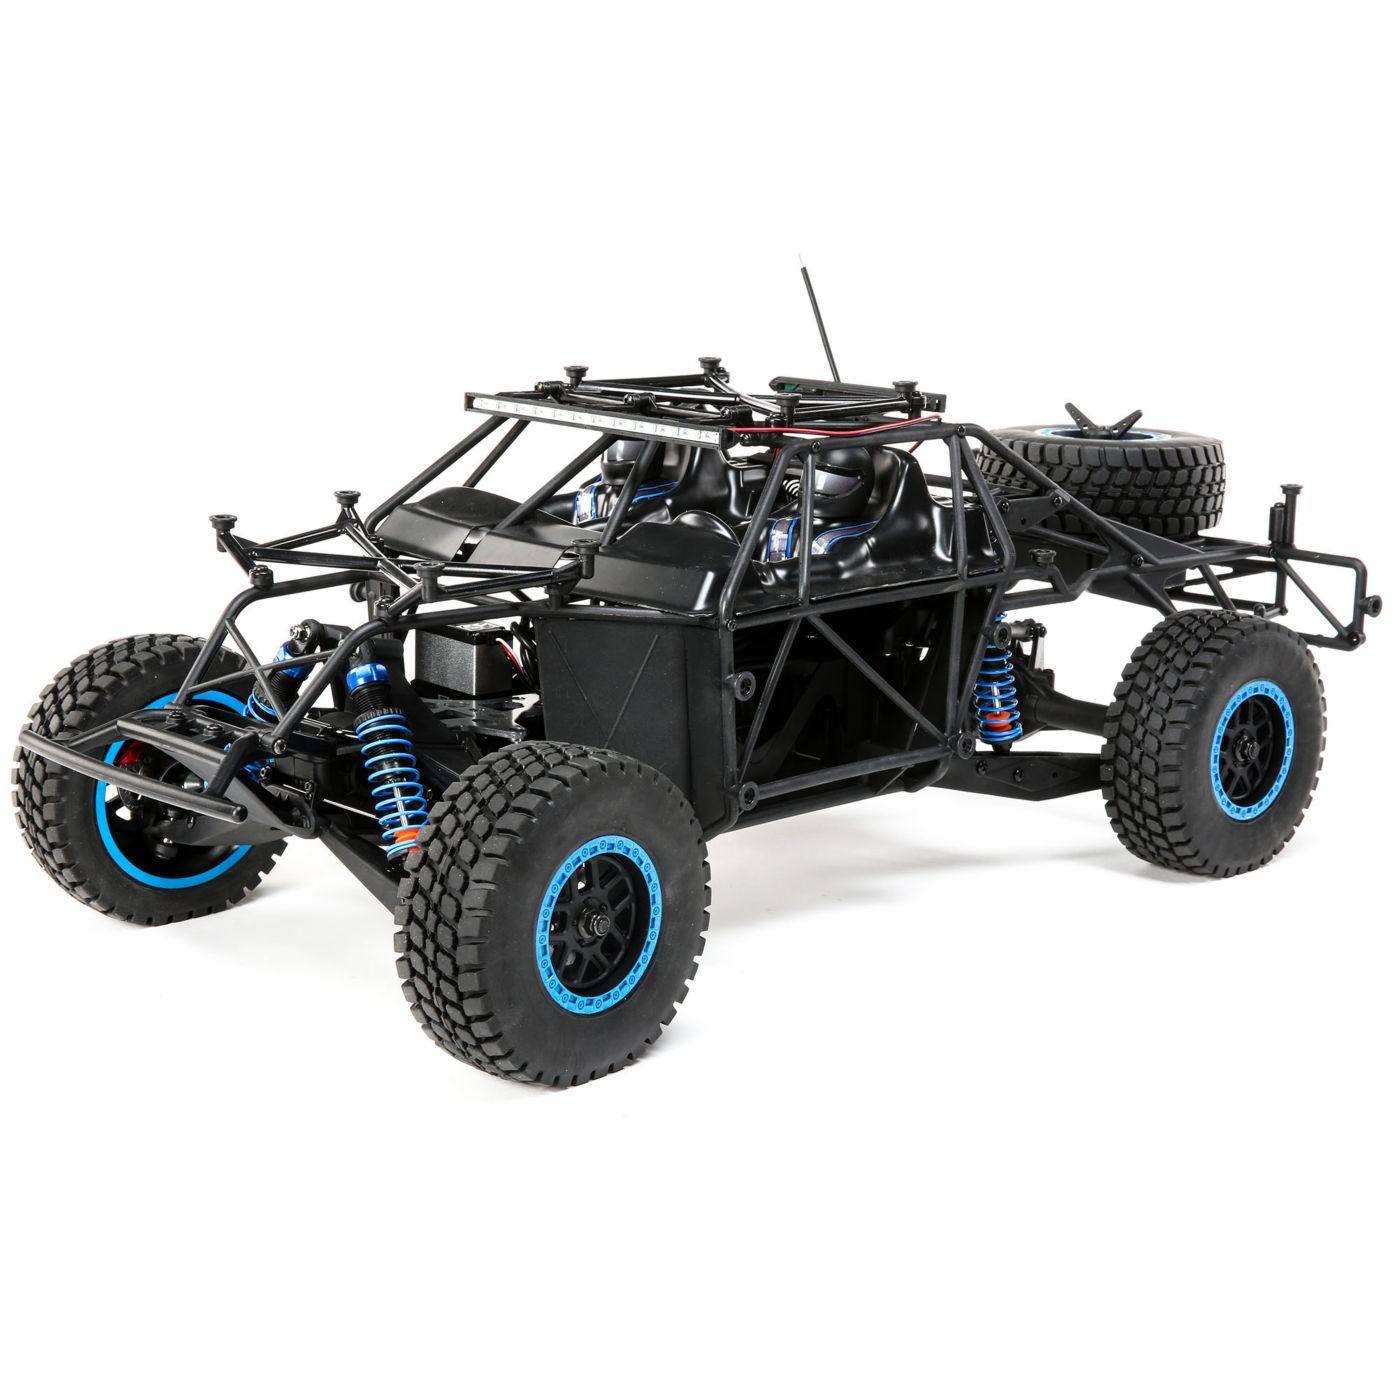 Losi Ford Raptor Baja Rey - Chassis